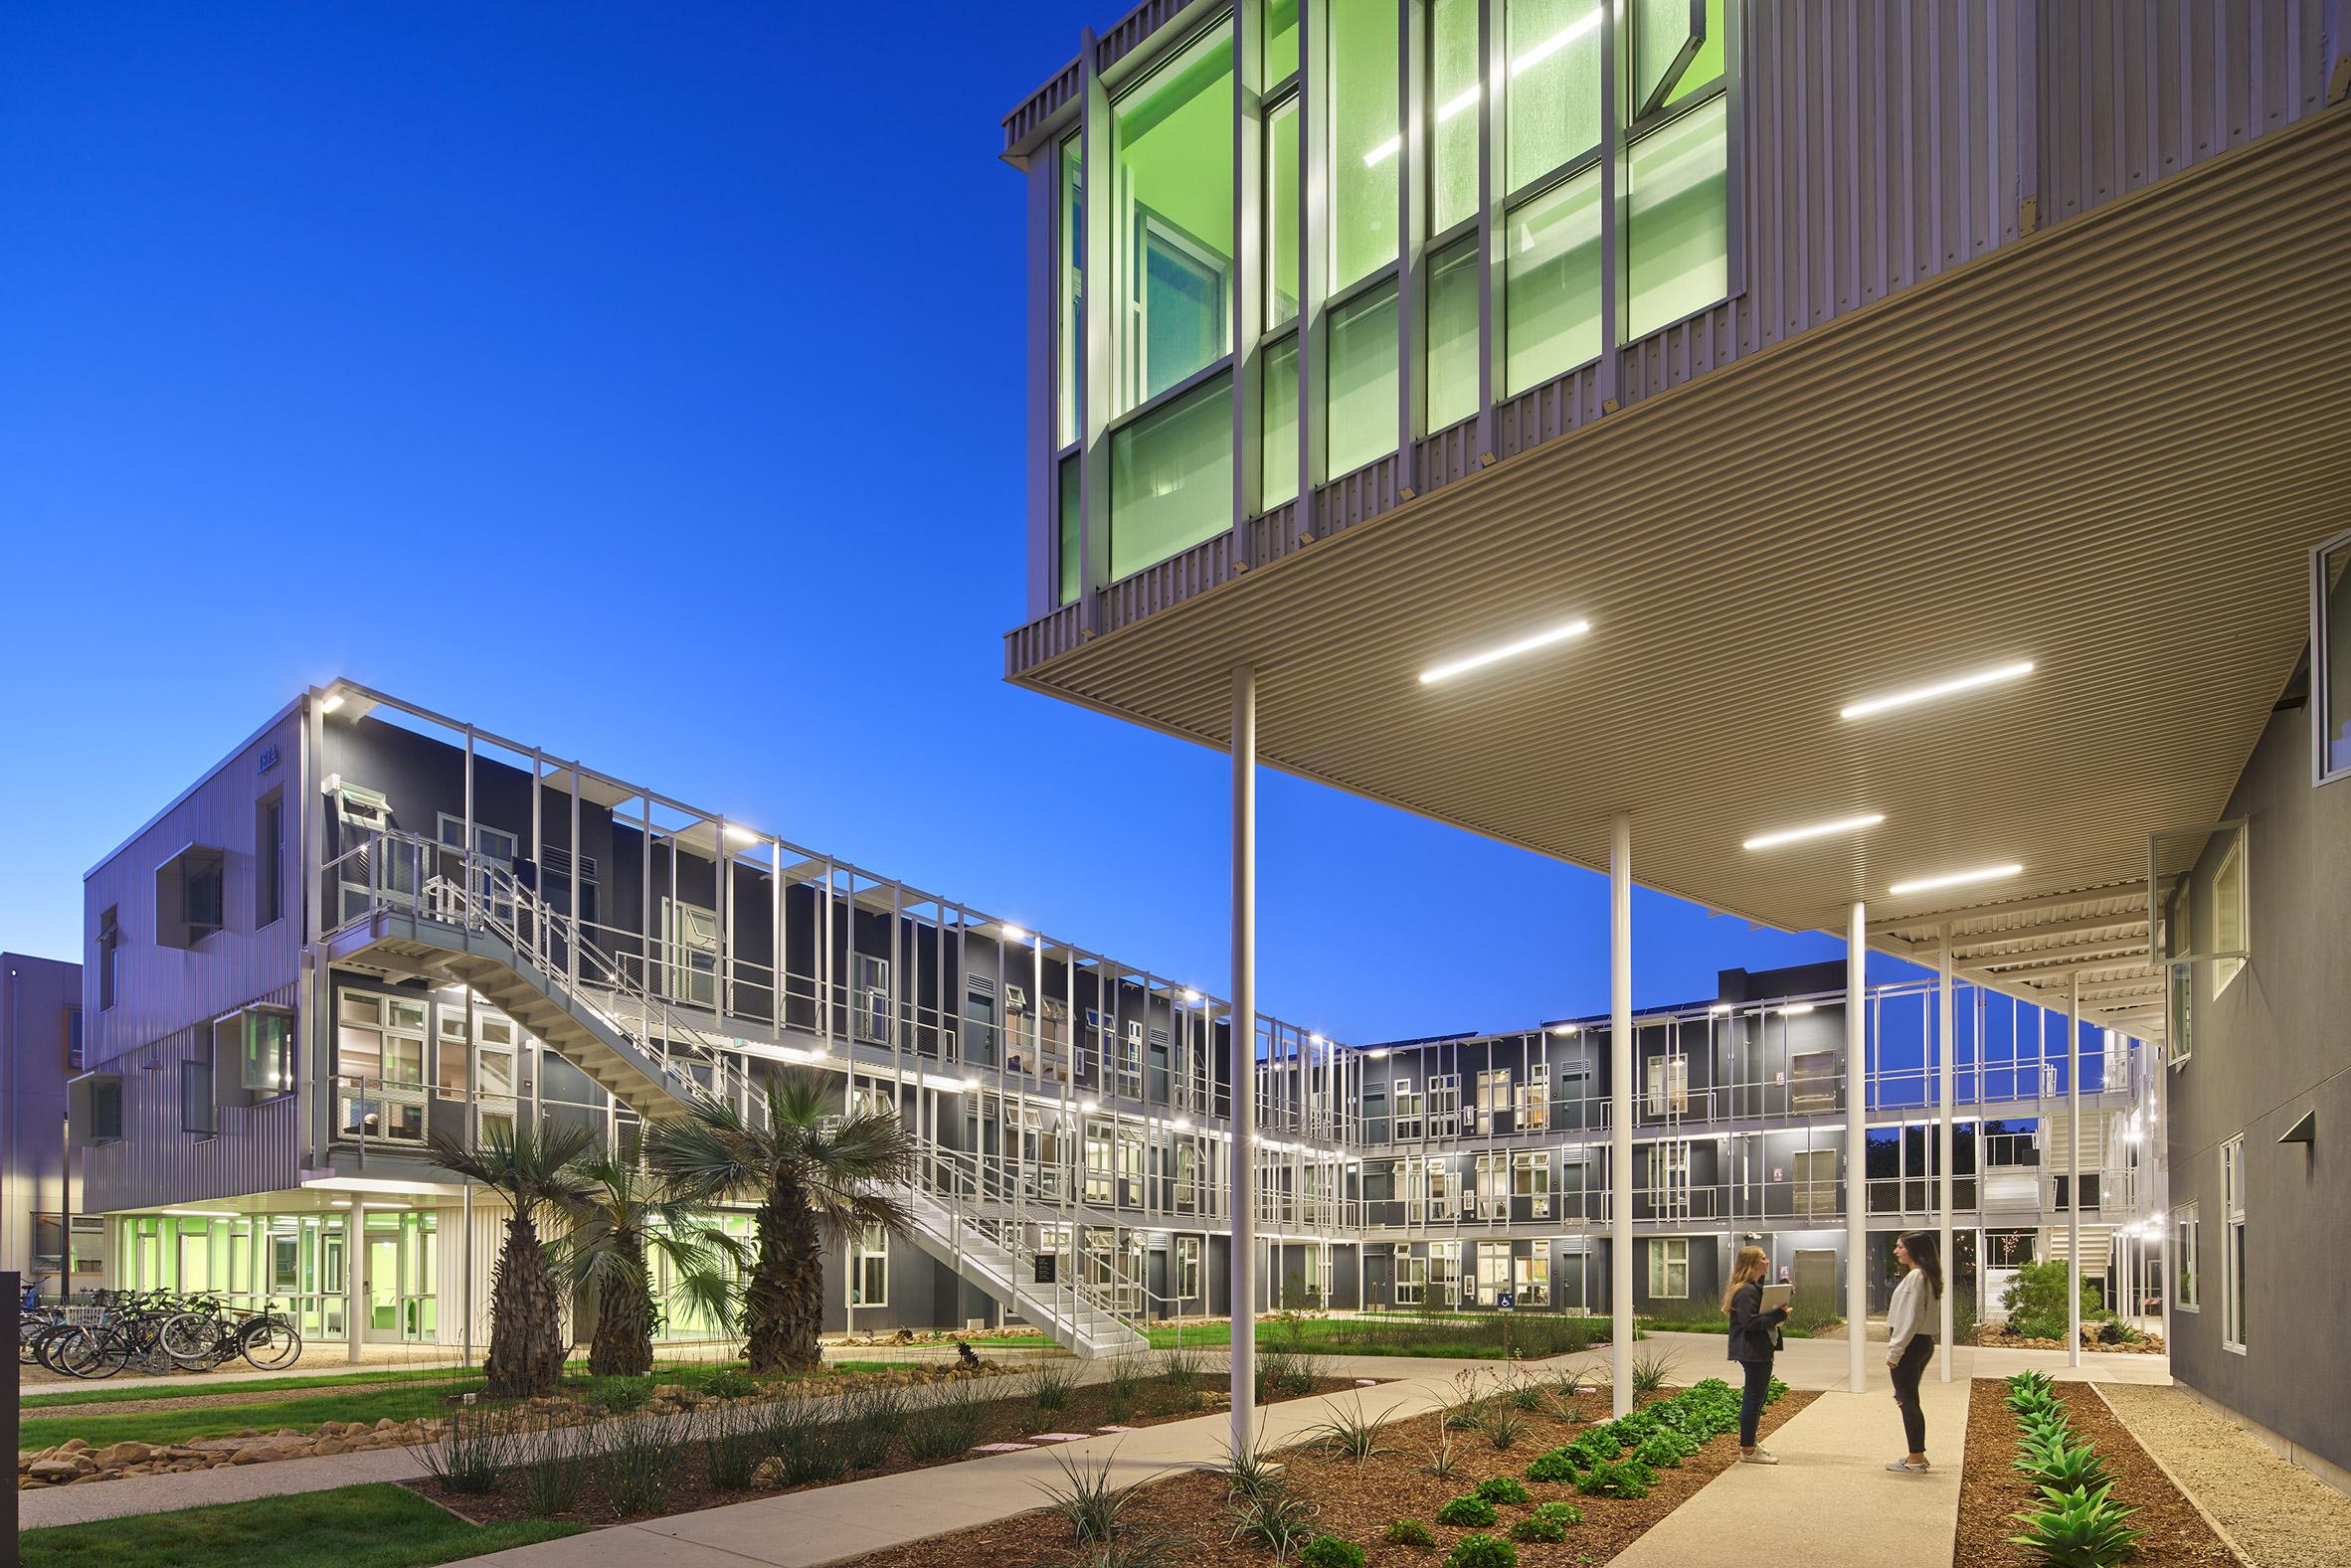 UCSB San Joaquin student housing by LOHA